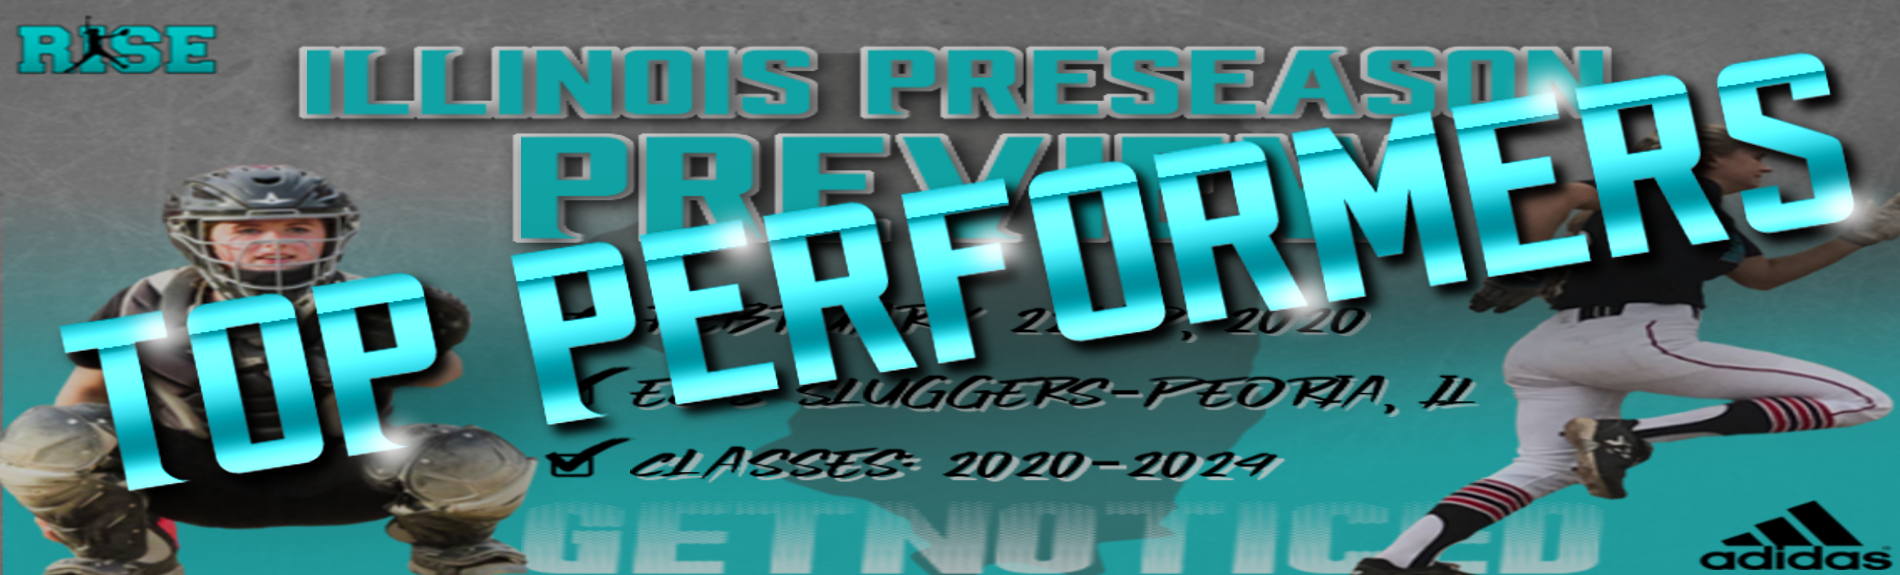 "Illinois Preseason Preview ""TOP PERFORMERS"""